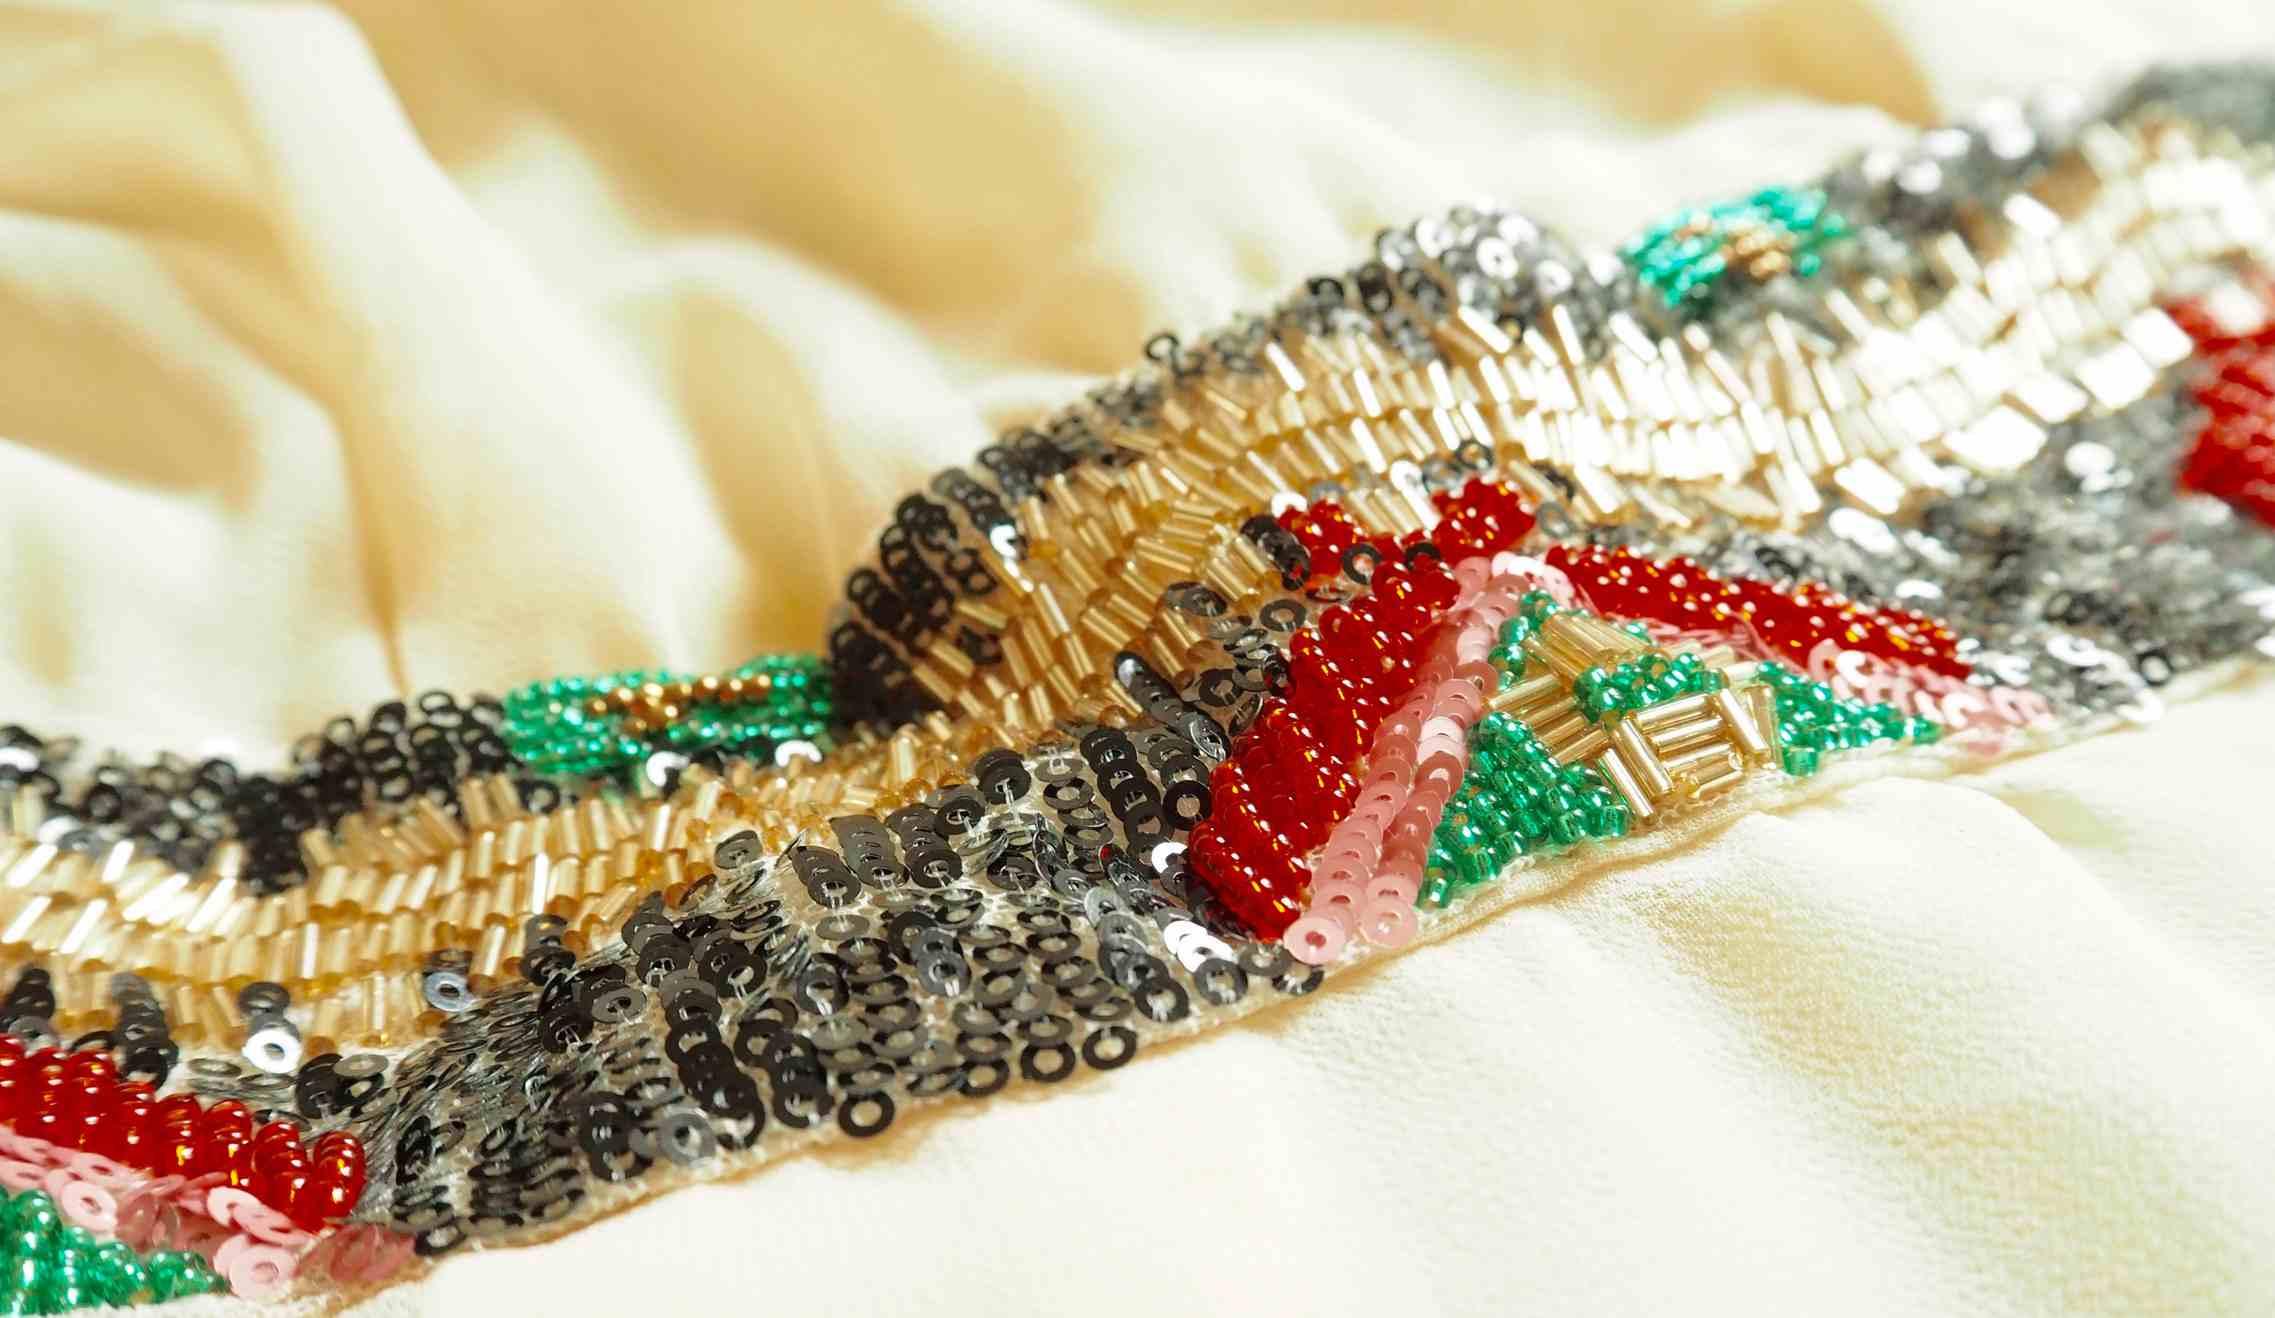 Close-Up Of Artwork On Dress